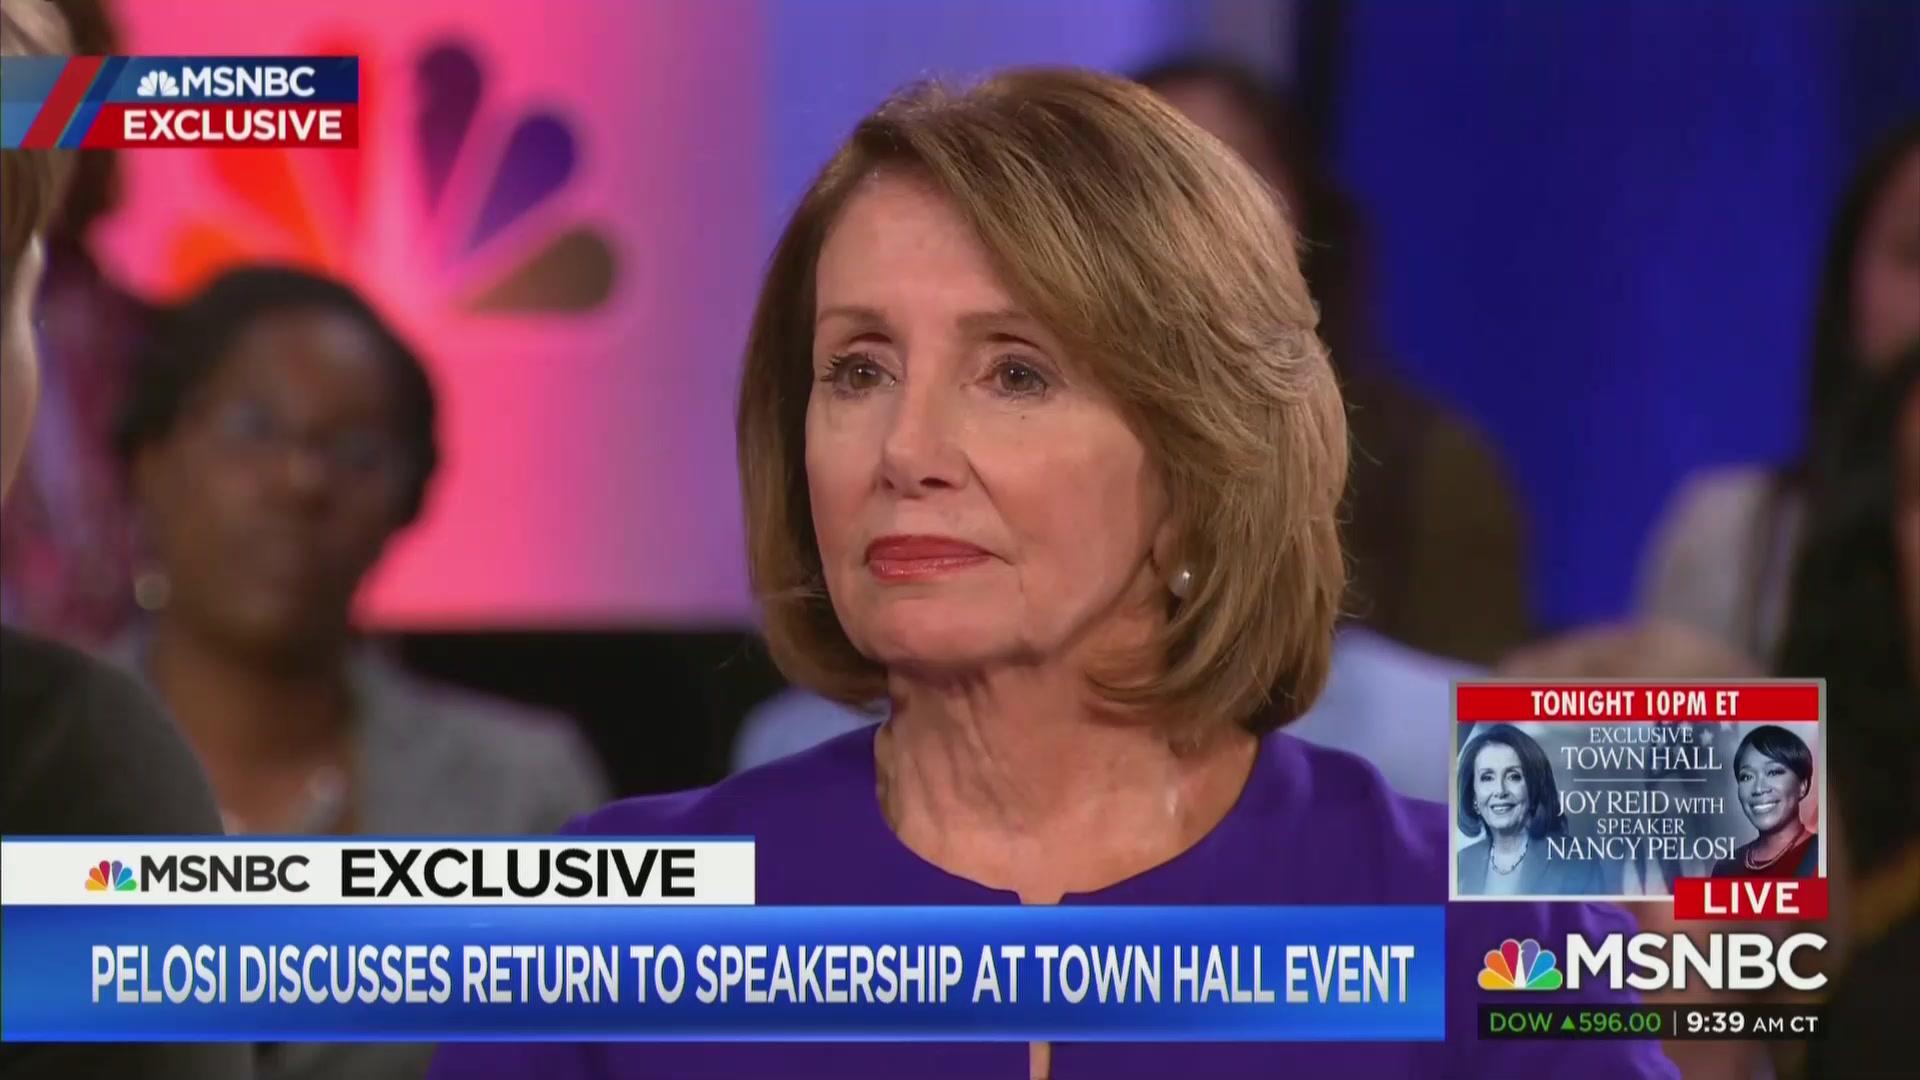 Nancy Pelosi: Rashida Tlaib's Impeachment Remarks 'Nothing Worse Than' Trump Has Said